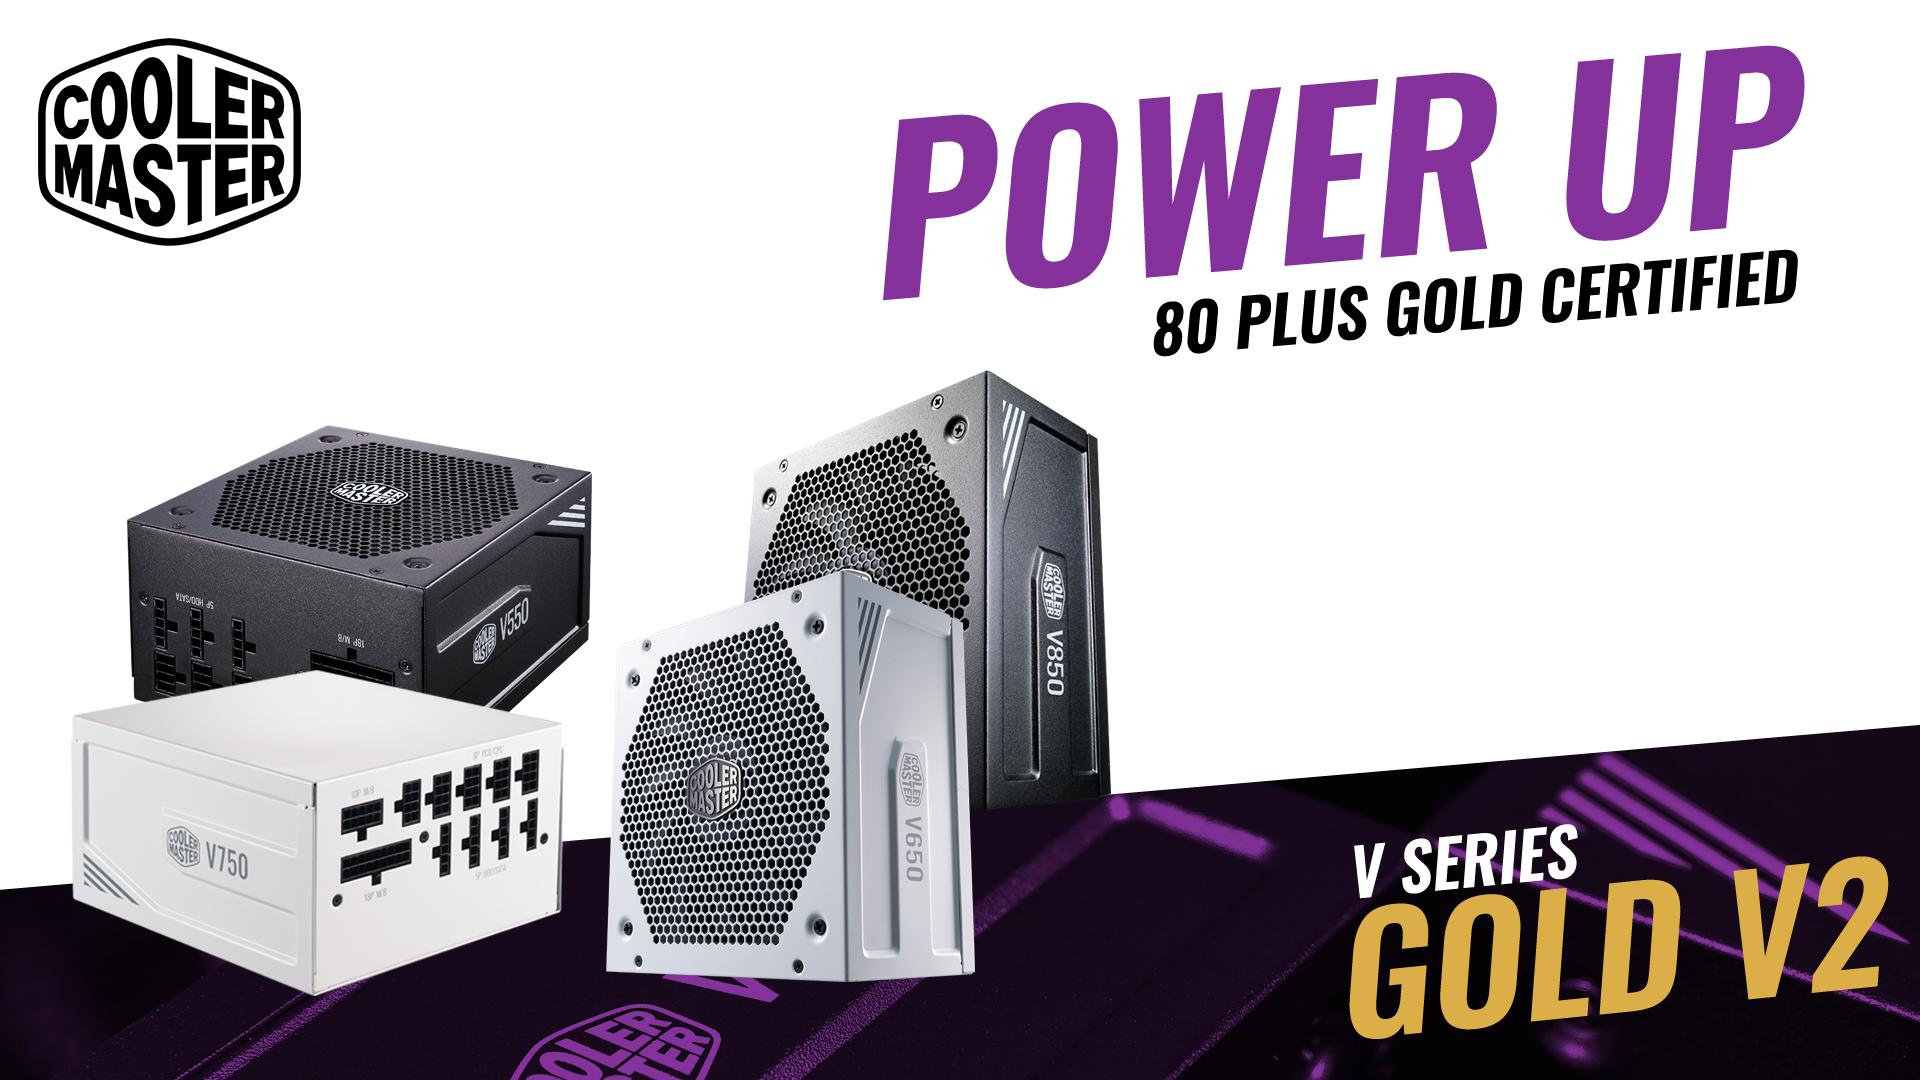 Cooler Master V Gold V2 Power Supply Unit